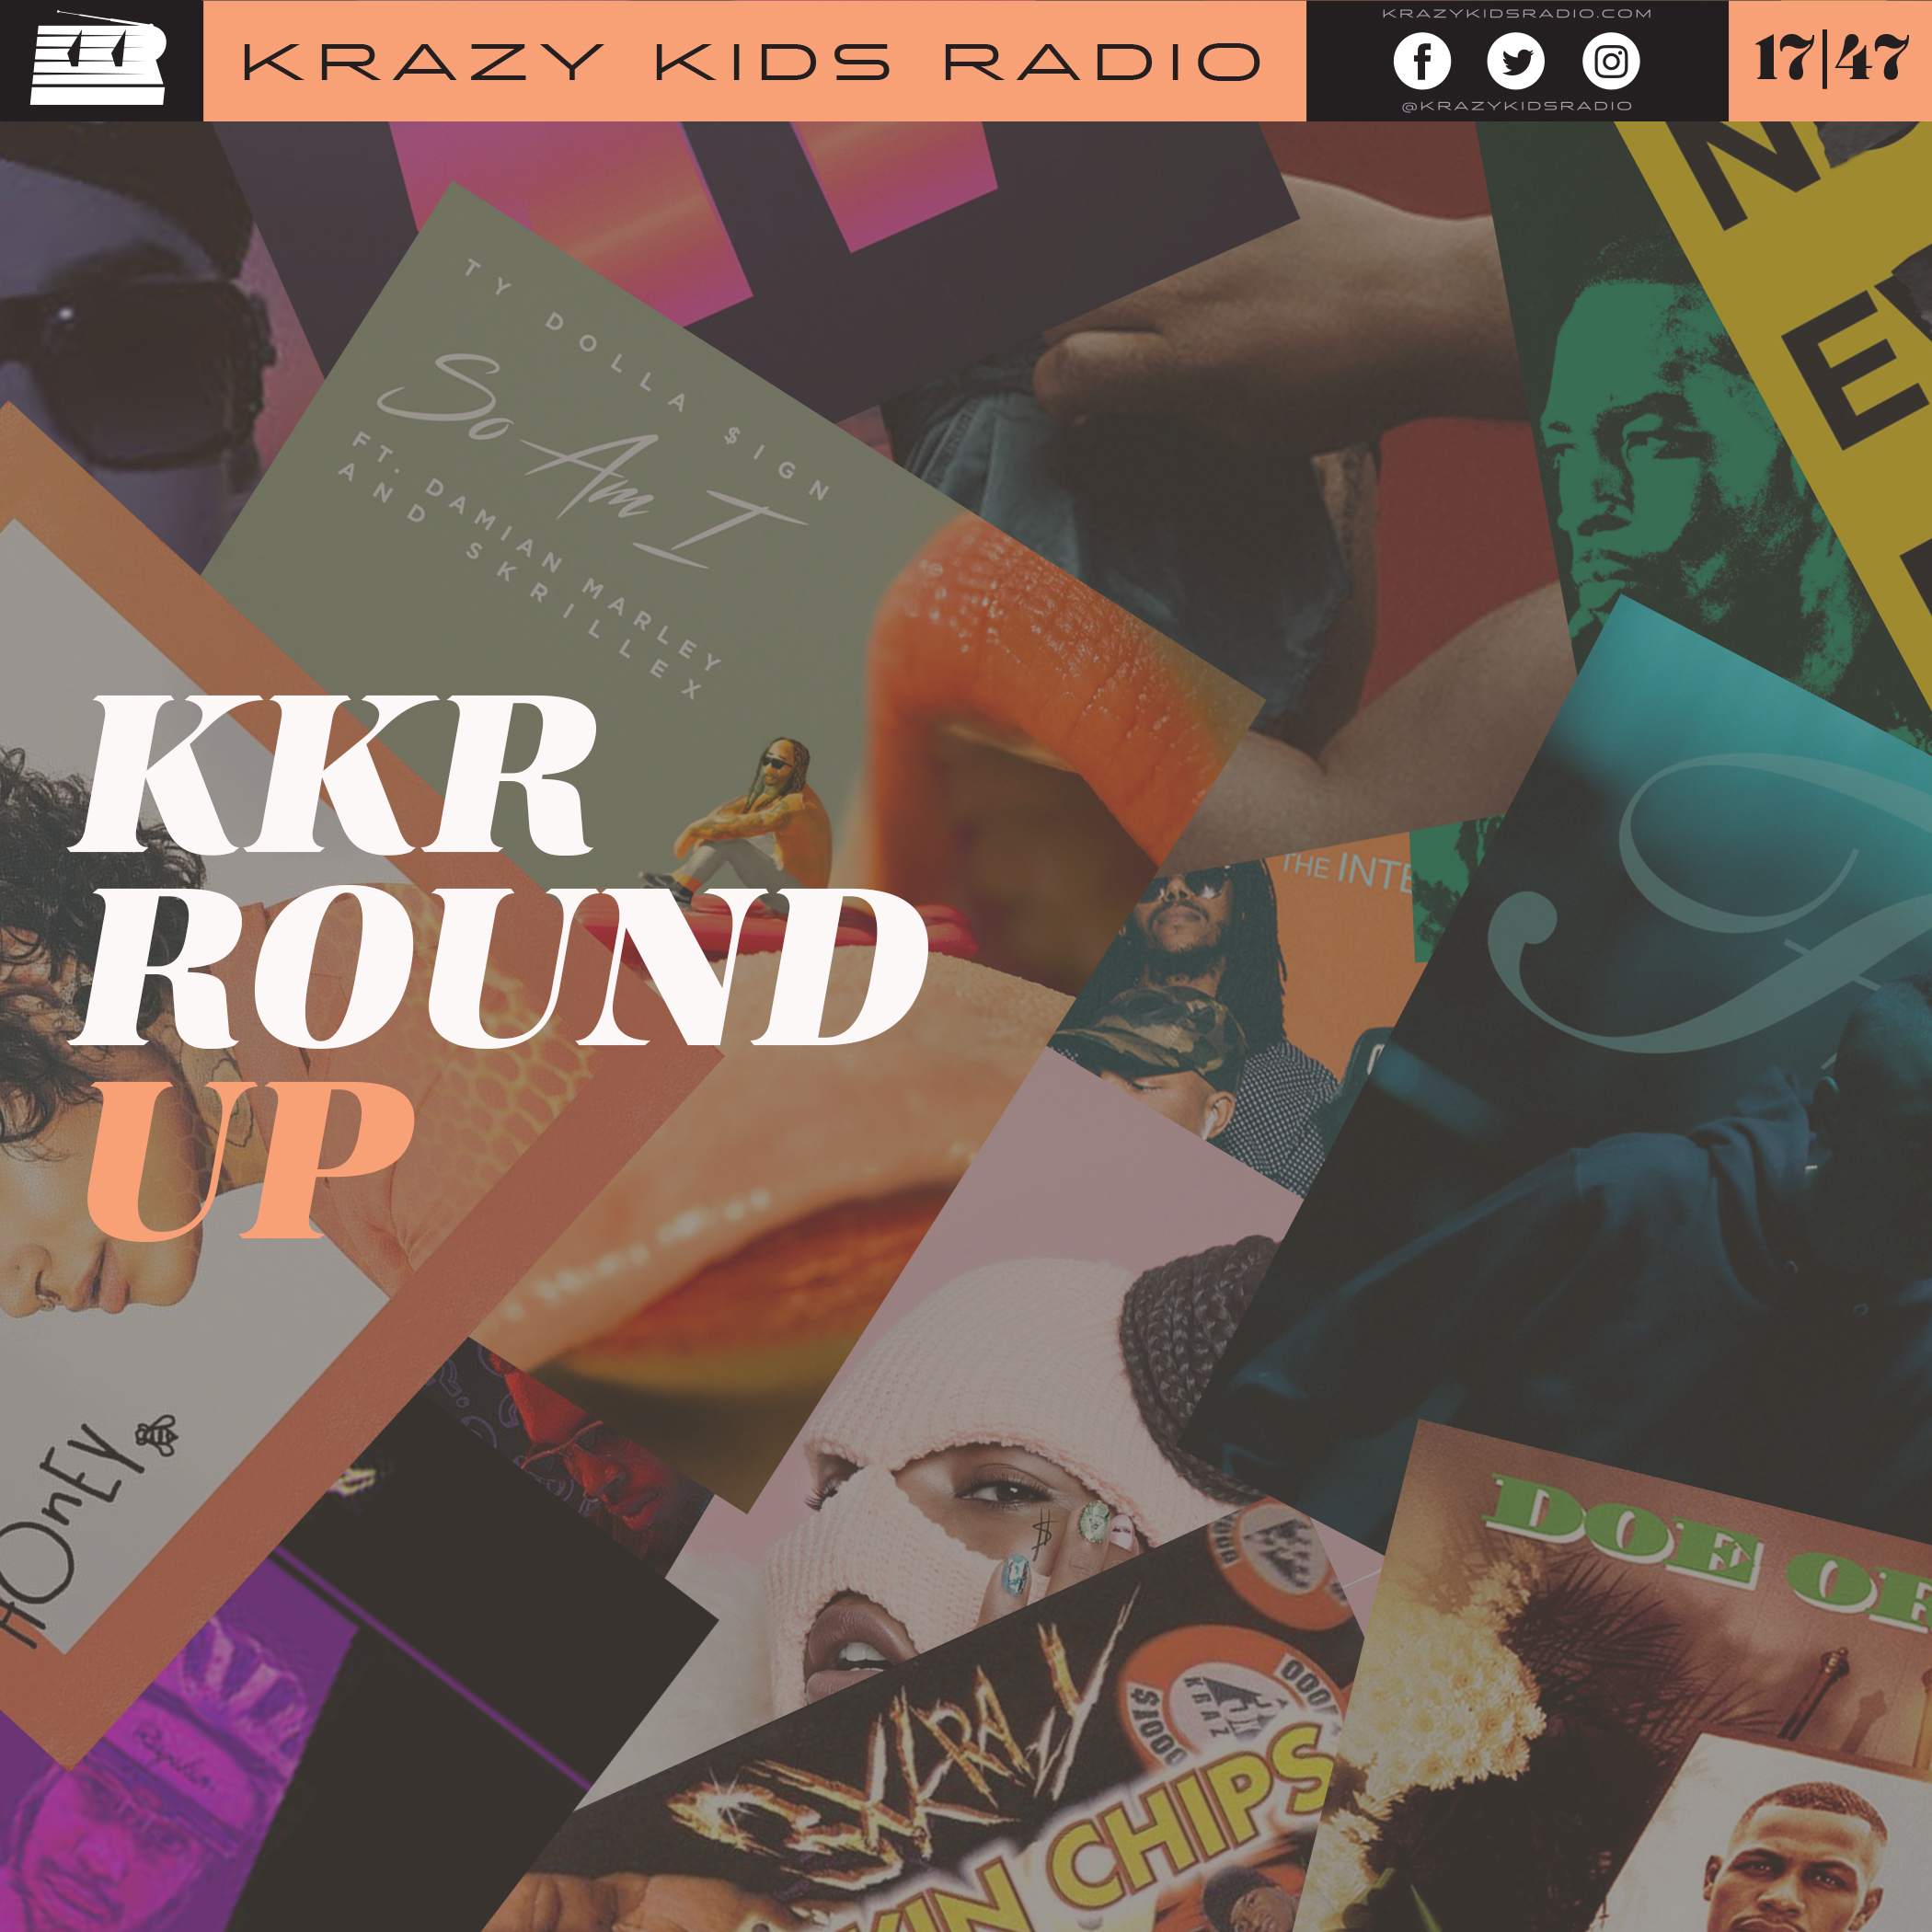 KKR_WEB_KKR_ROUND-UP_NOV2017.jpg